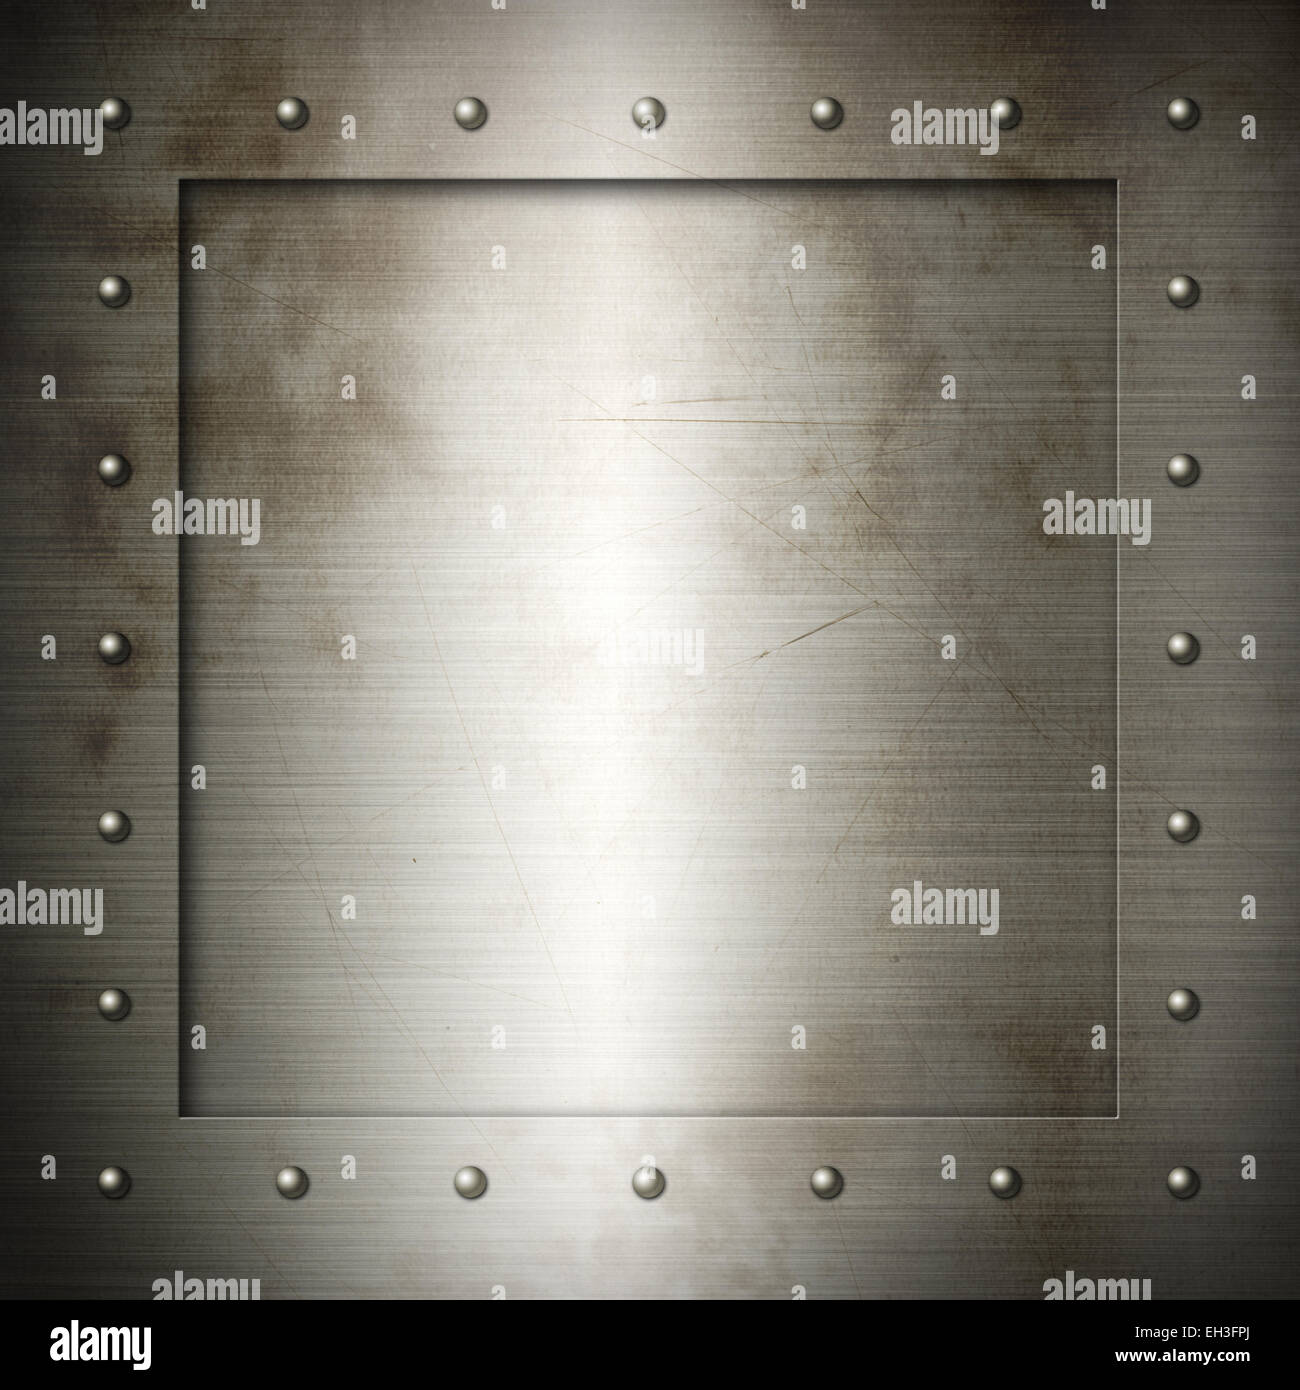 Alte aus gebürstetem Stahl Rahmen Textur Hintergrundbild Stockfoto ...